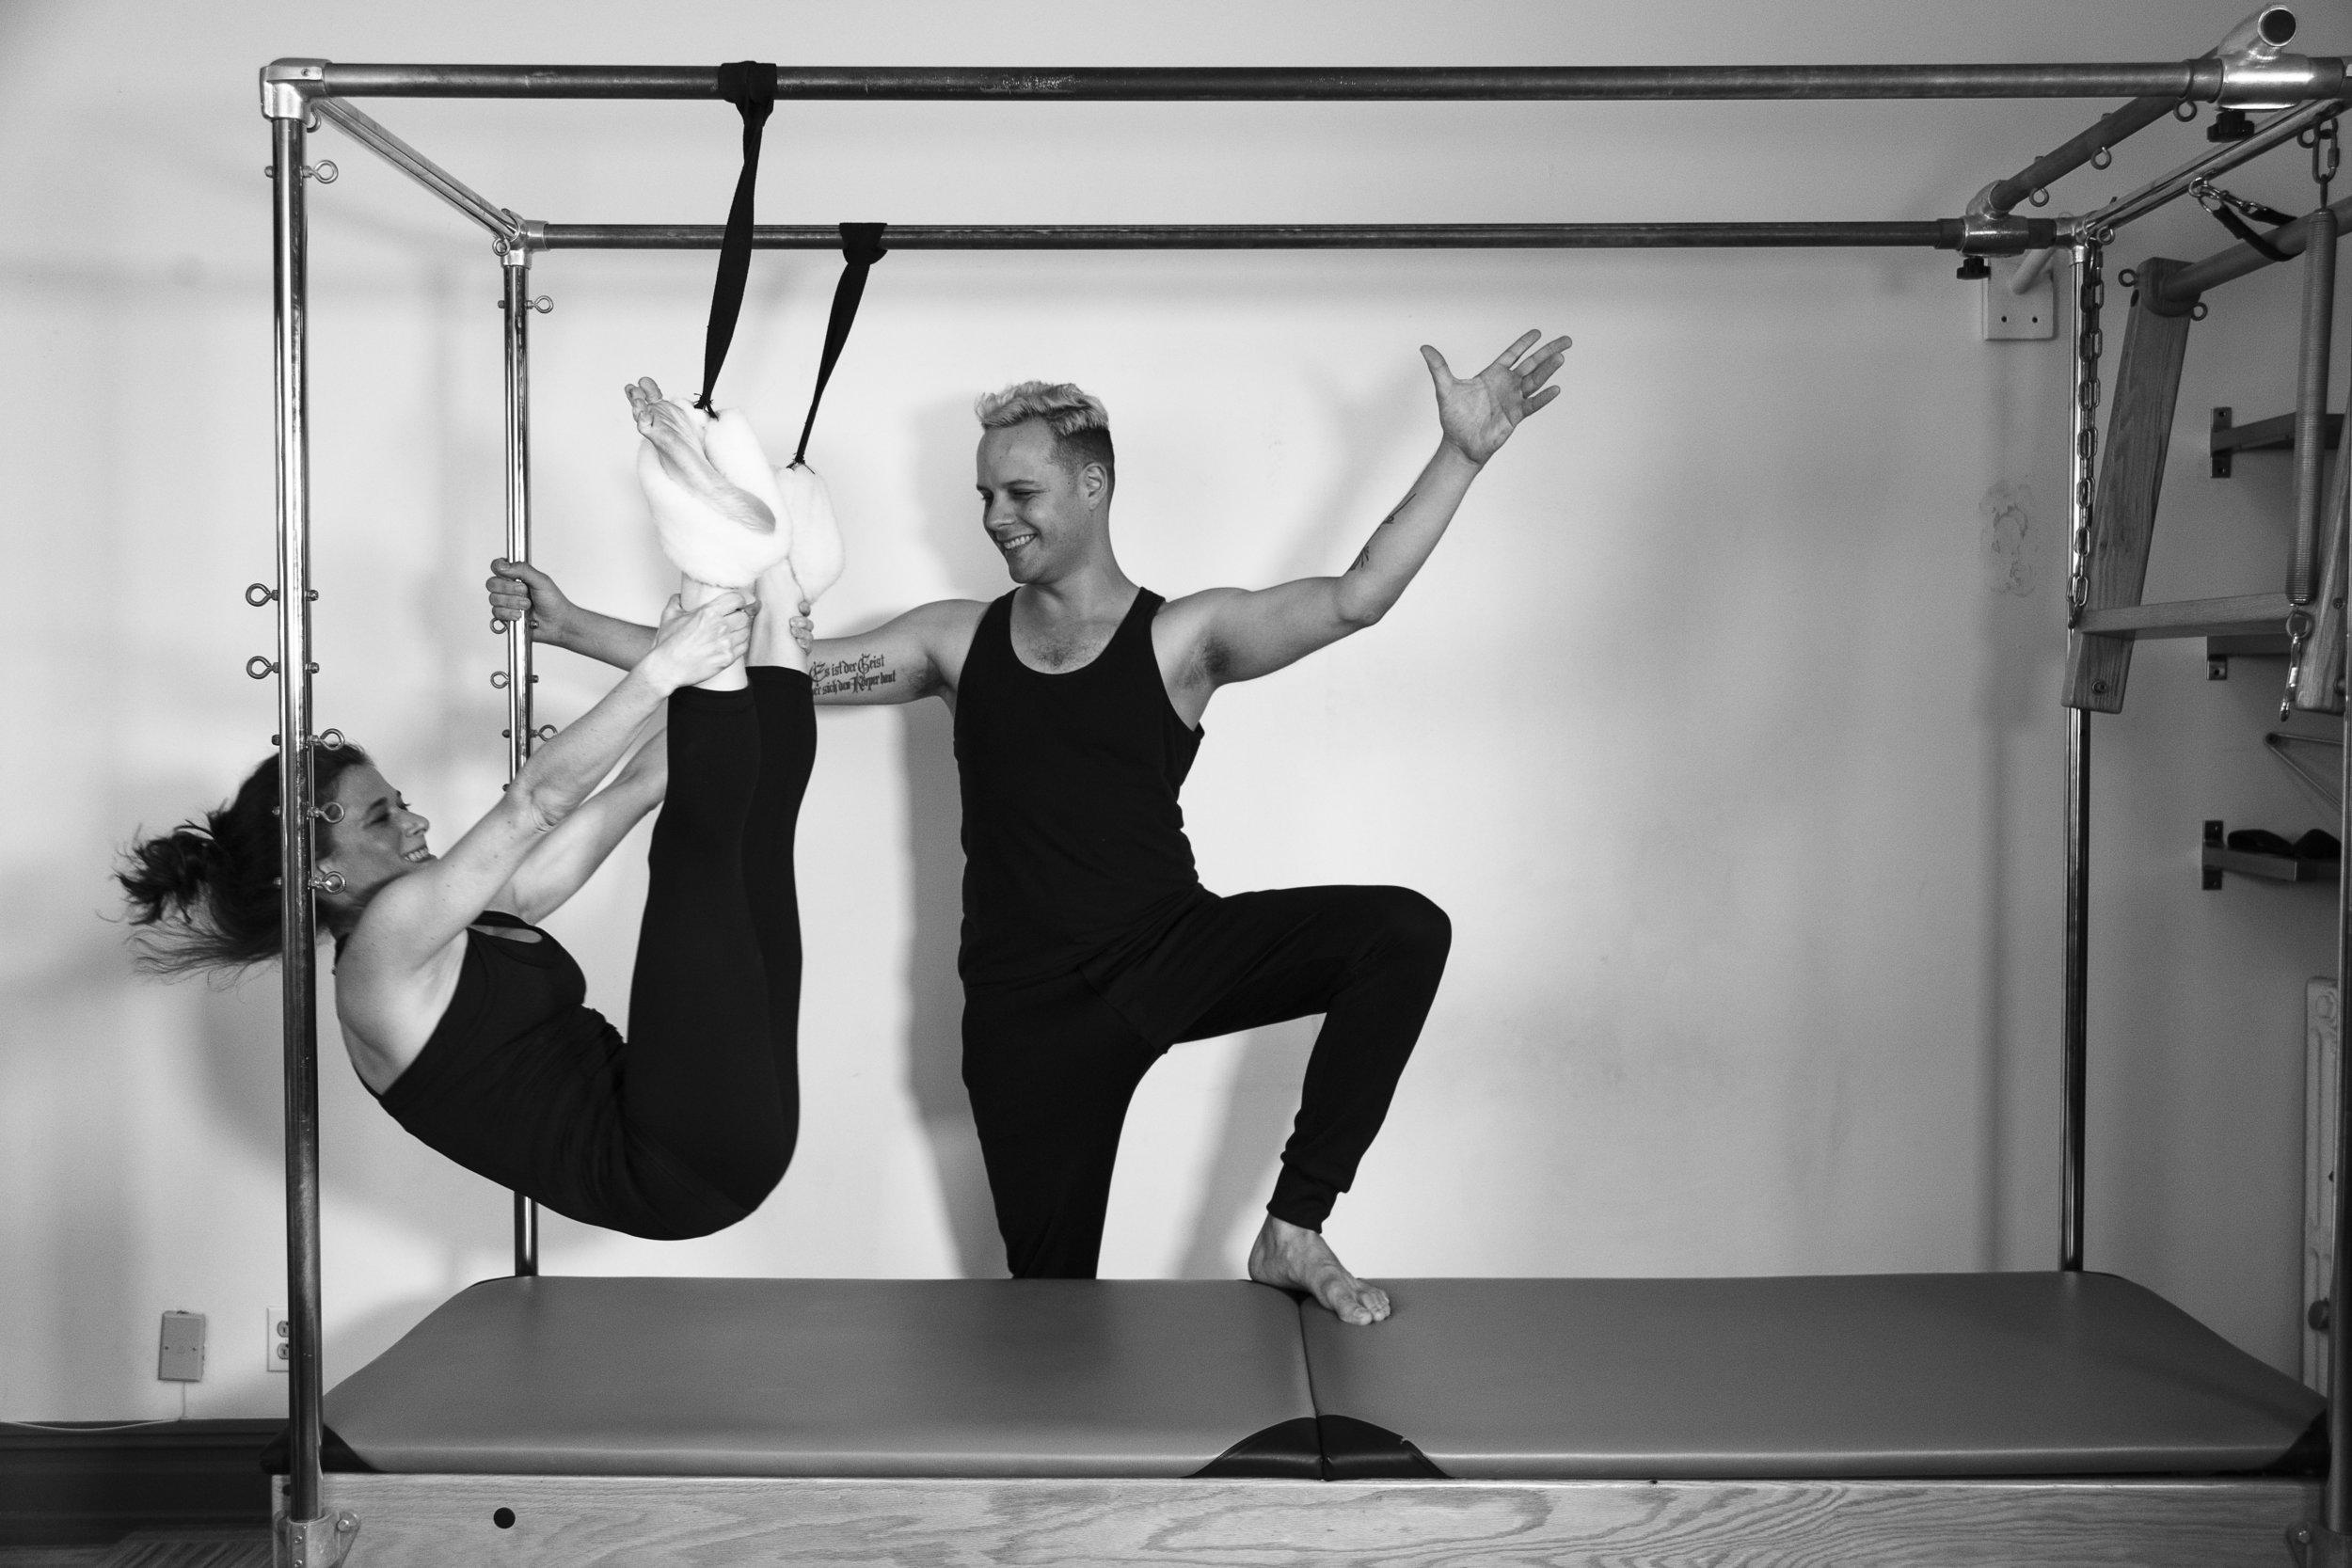 Private Training at BodyTonic Pilates